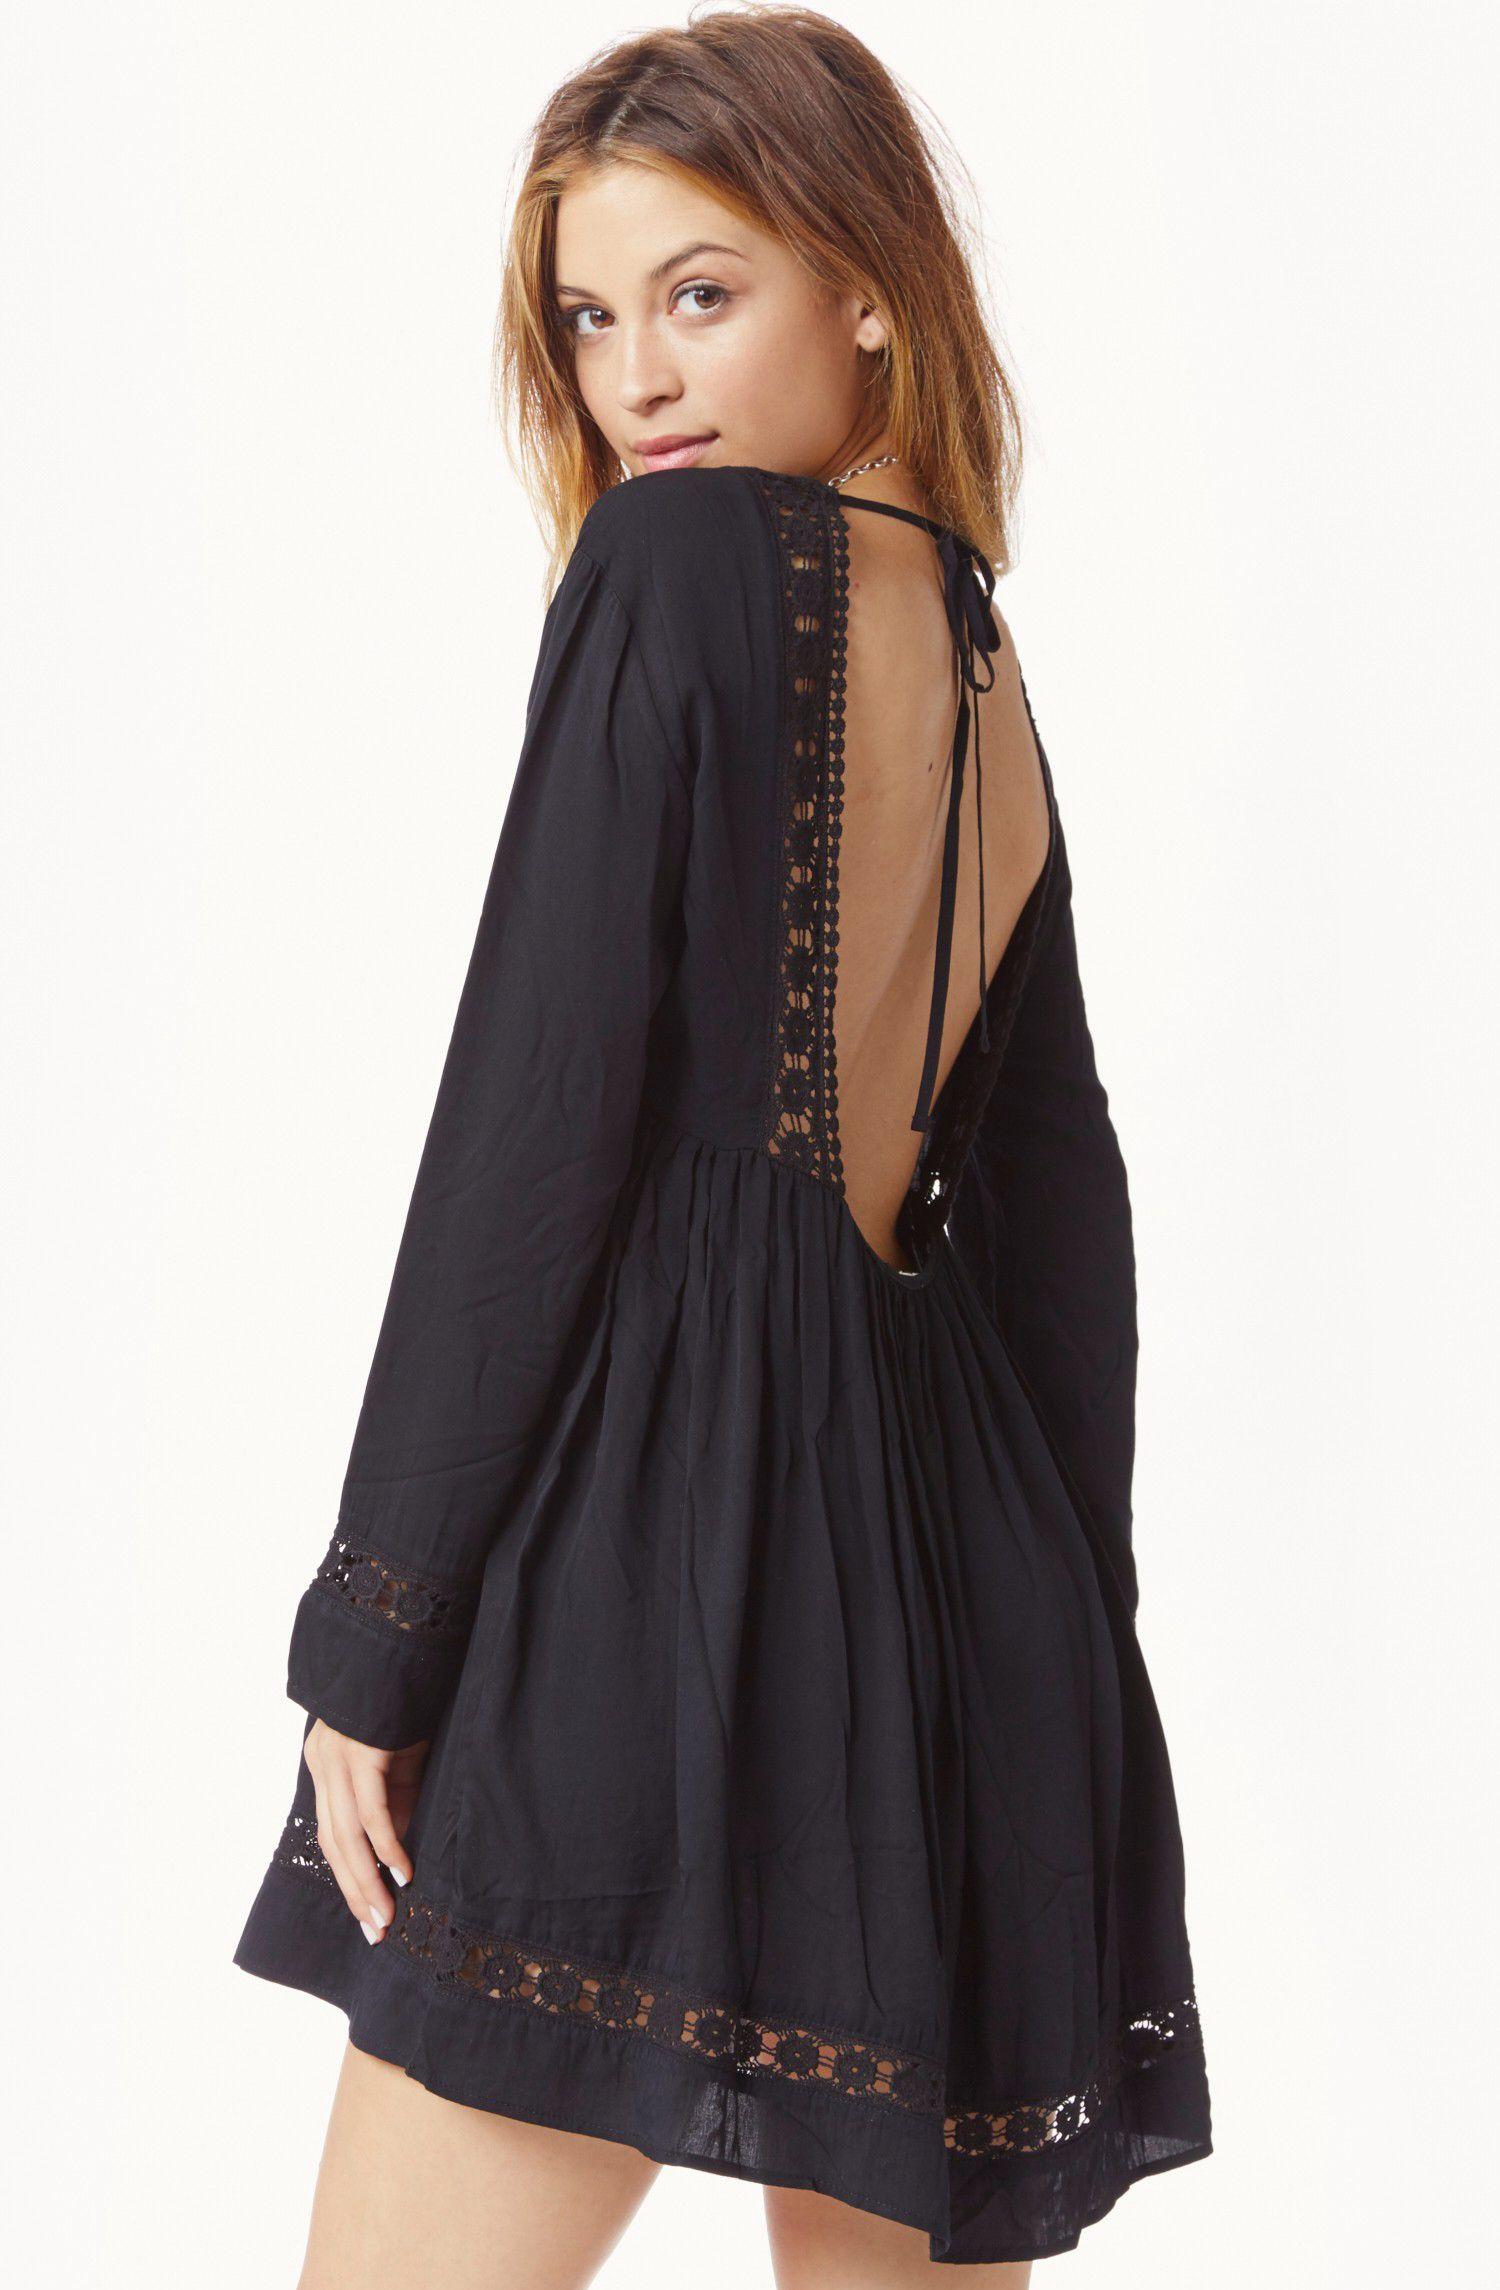 Black long sleeve backless dress my style pinterest long